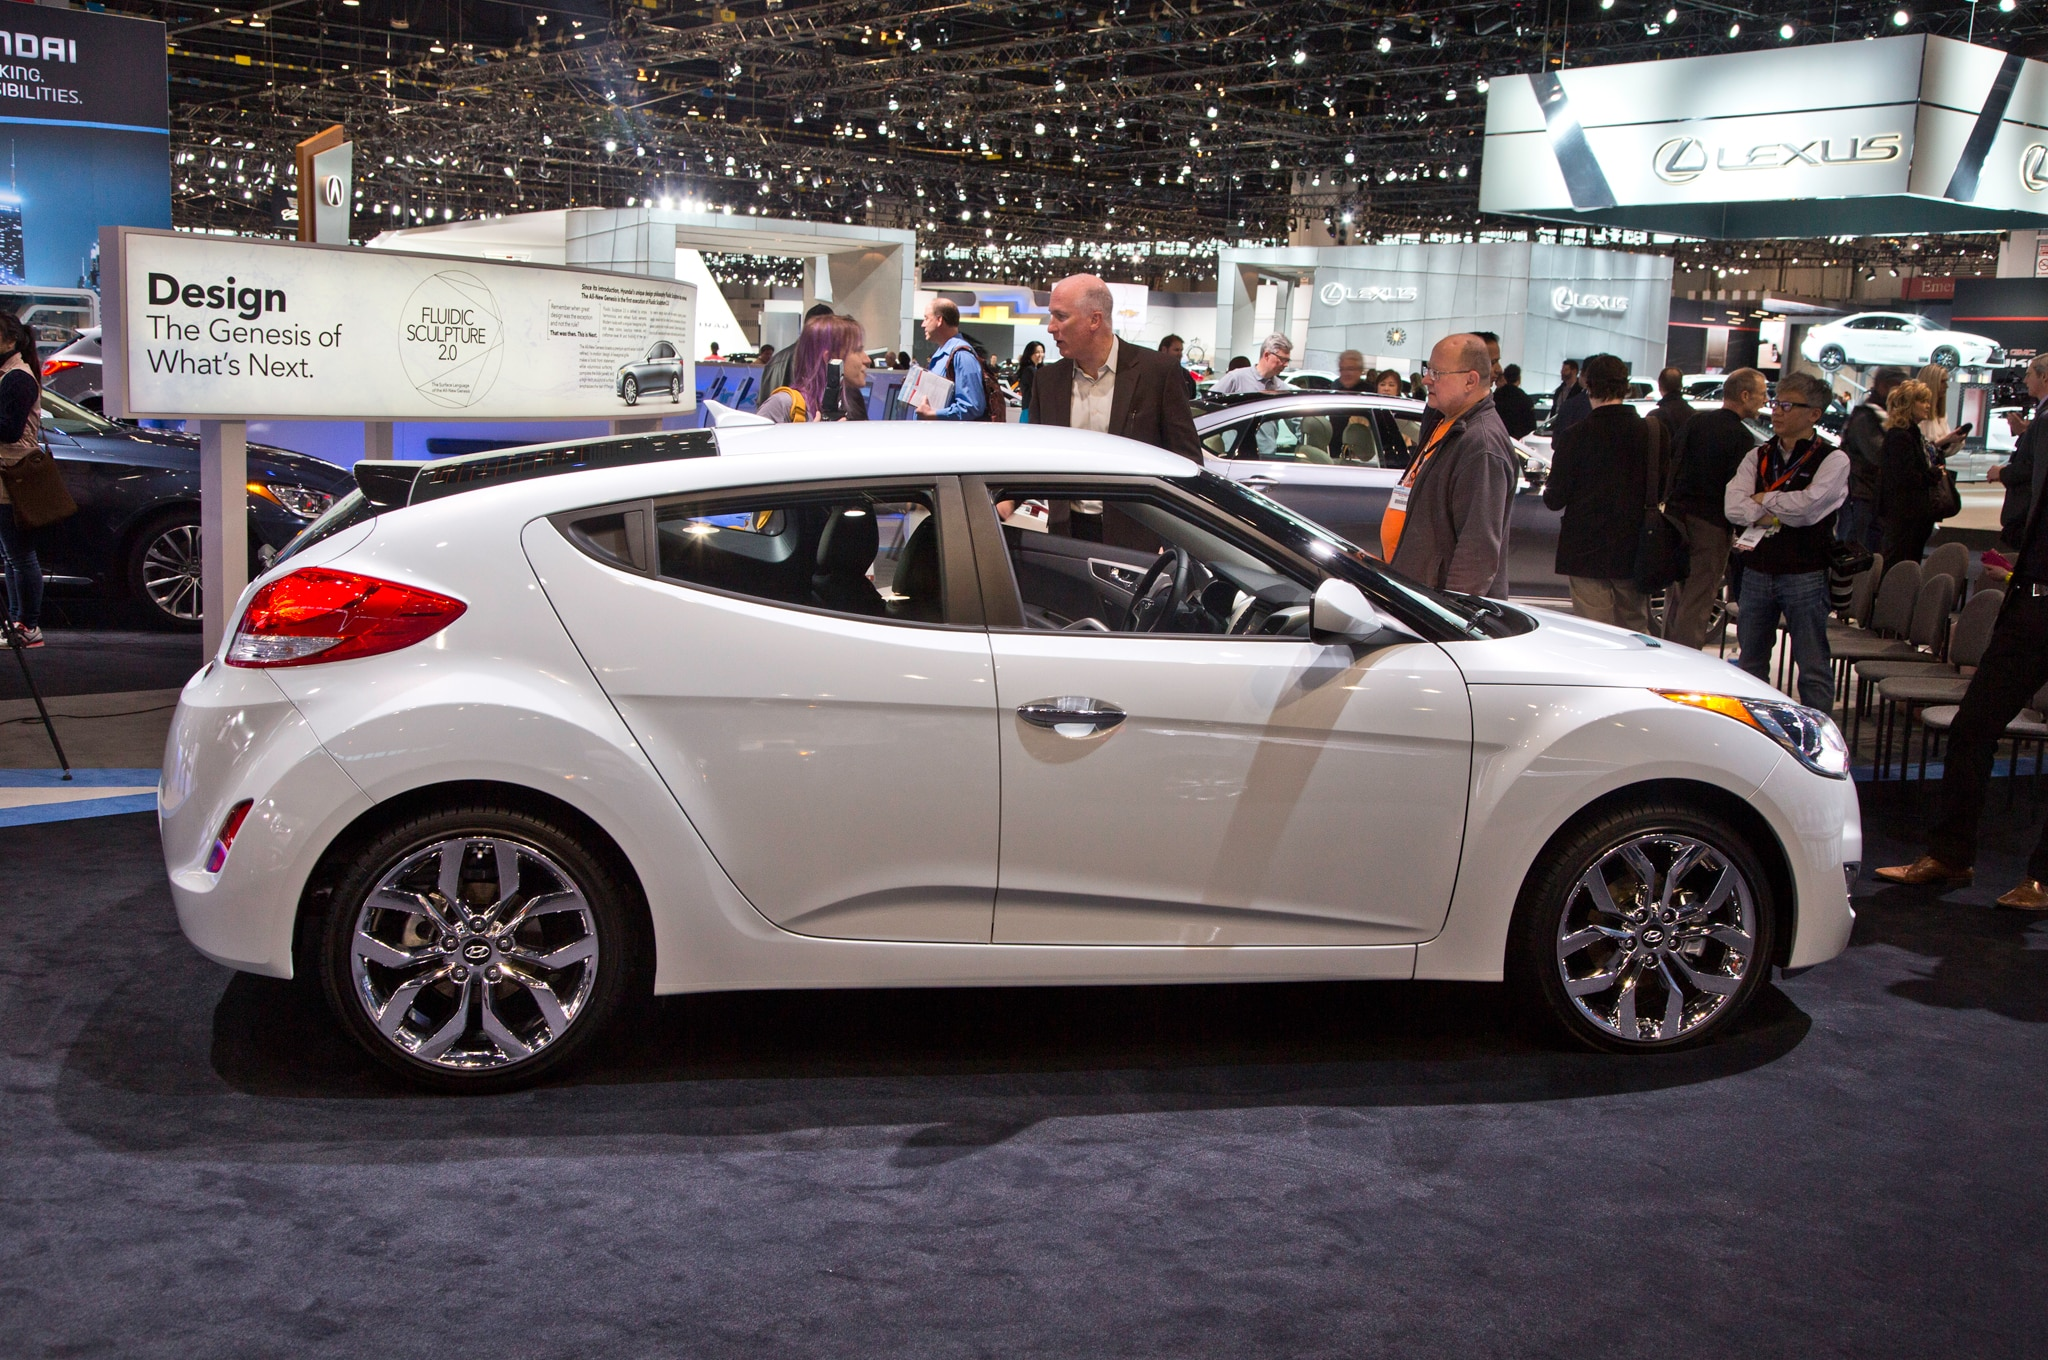 2014 Hyundai Veloster Re Flex Debuts At 2014 Chicago Auto